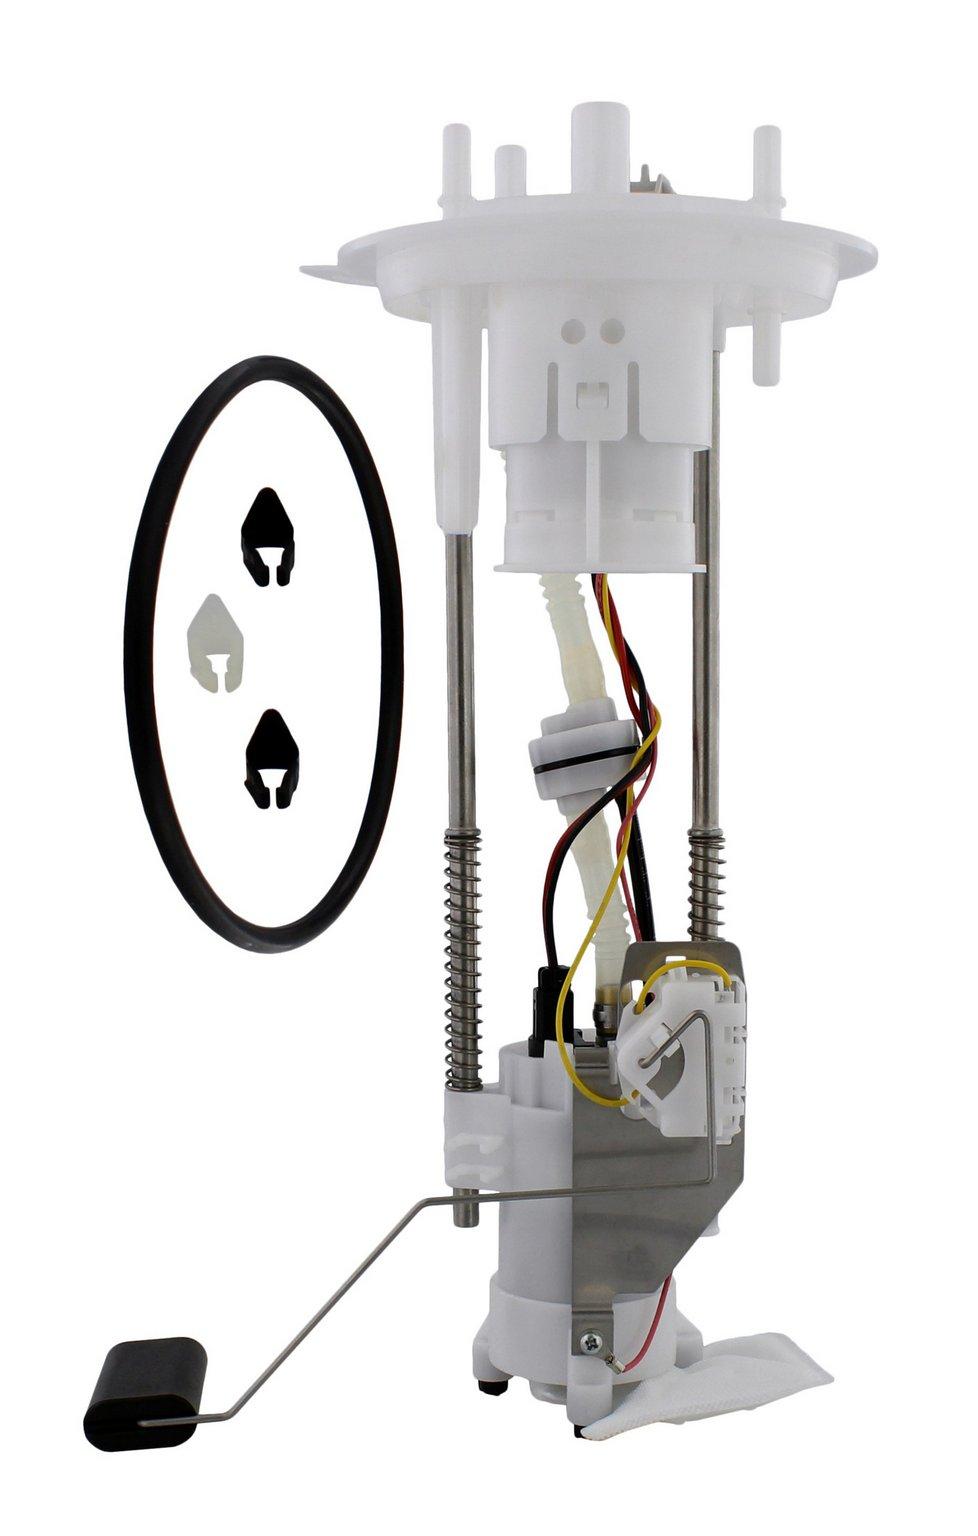 HFP-386-PR104 Fuel Pump Replacement for Suzuki GSX-S1000//SV650//V-Strom 1000 DL1000 EFI Replaces 15100-04K00 15100-18K00 15100-31J01 HFP-386-U-1252